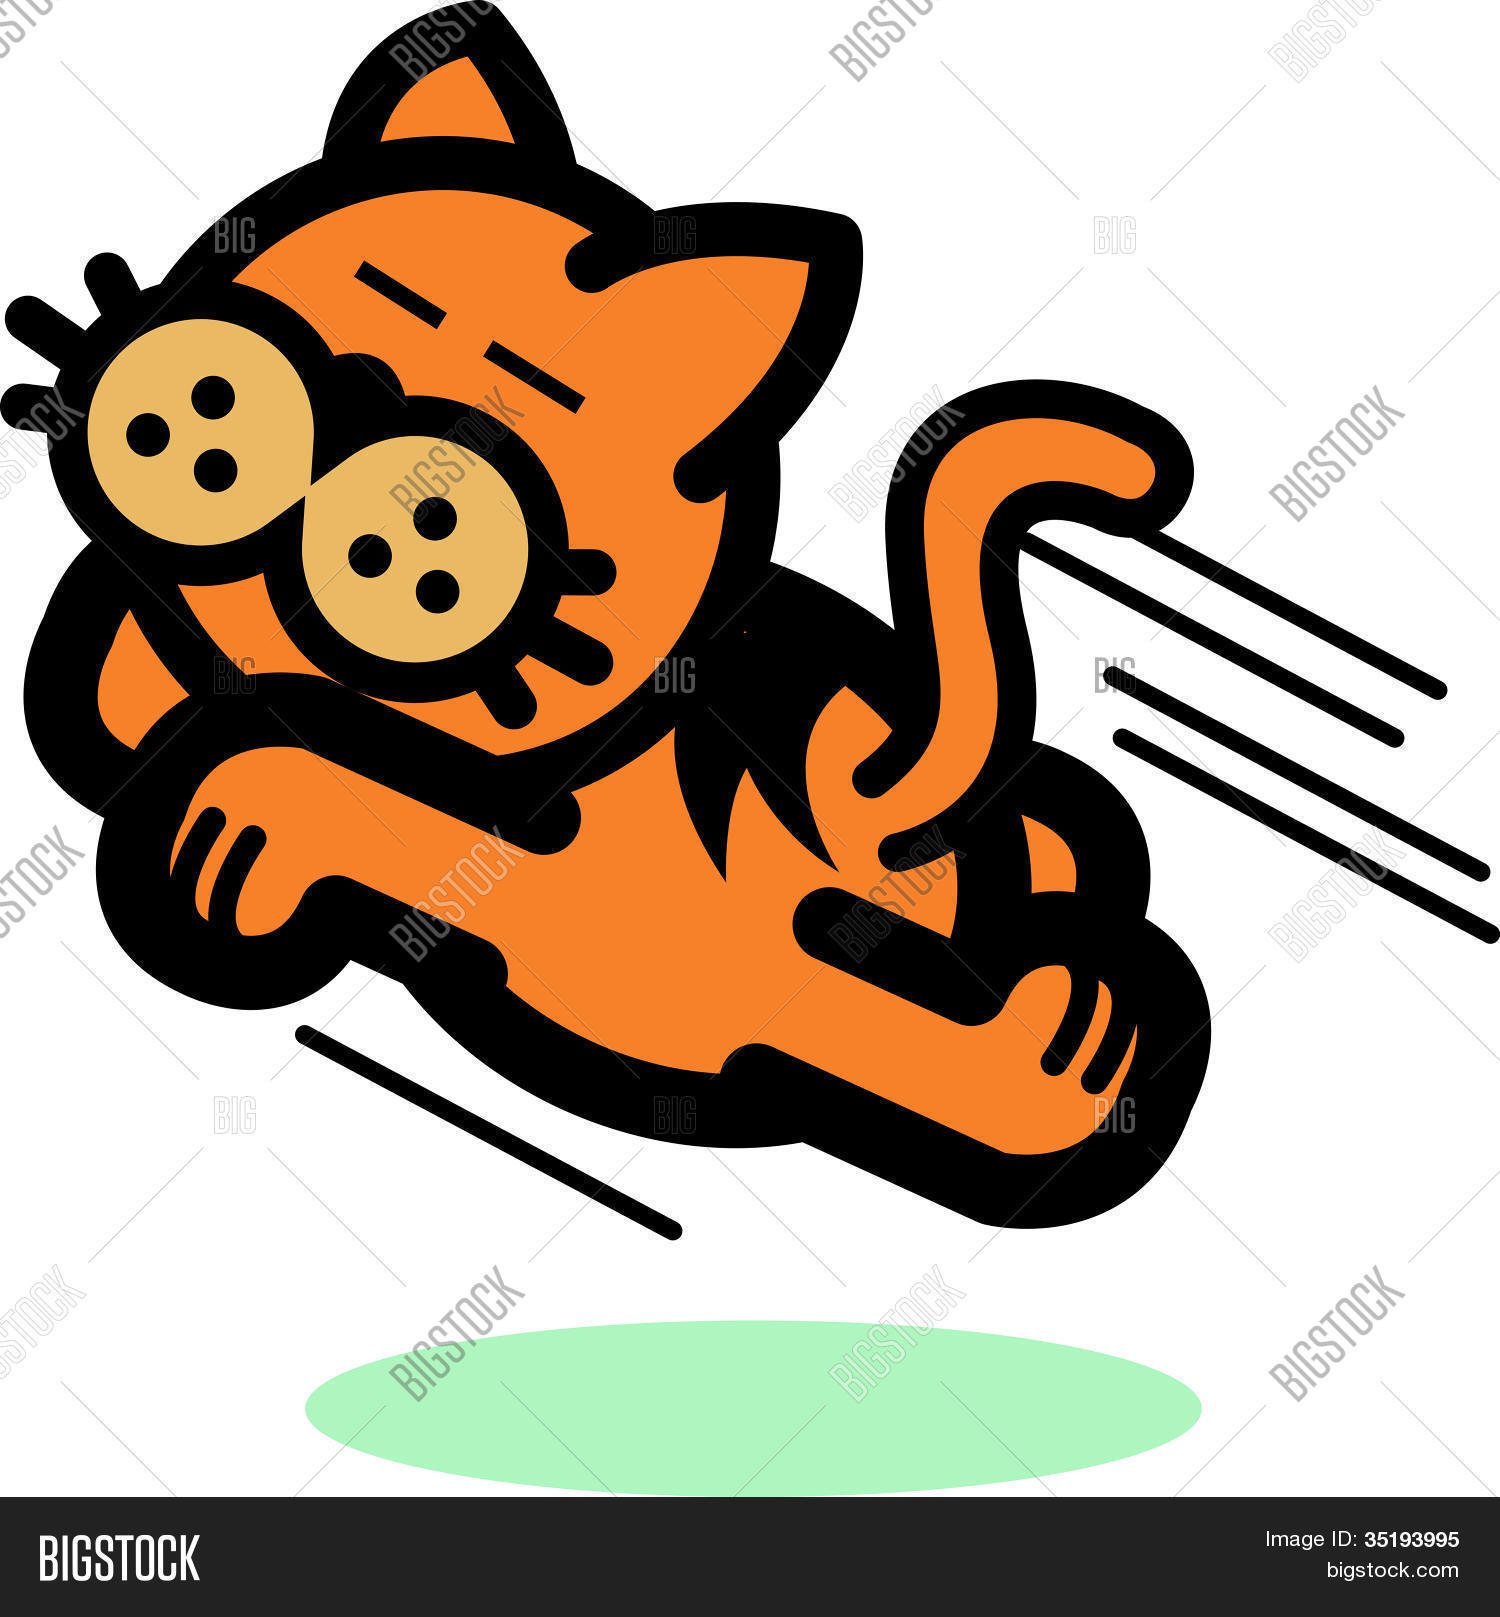 Cat Clip Art Running and Jumping Stock Vector & Stock Photos.